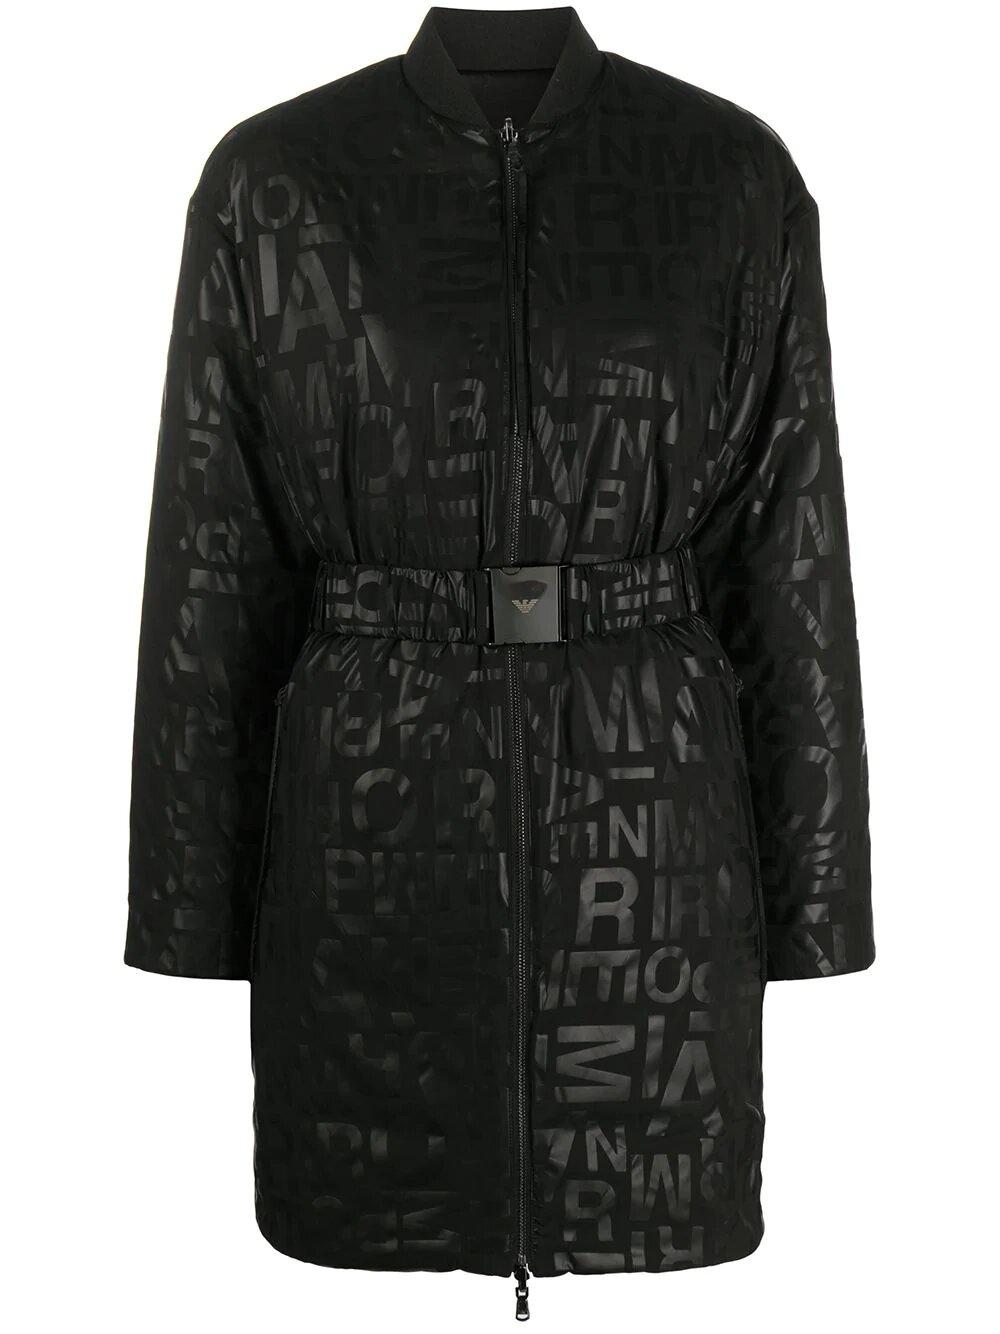 Emporio Armani, Graphic-print puffer coat 967лв, 677лв